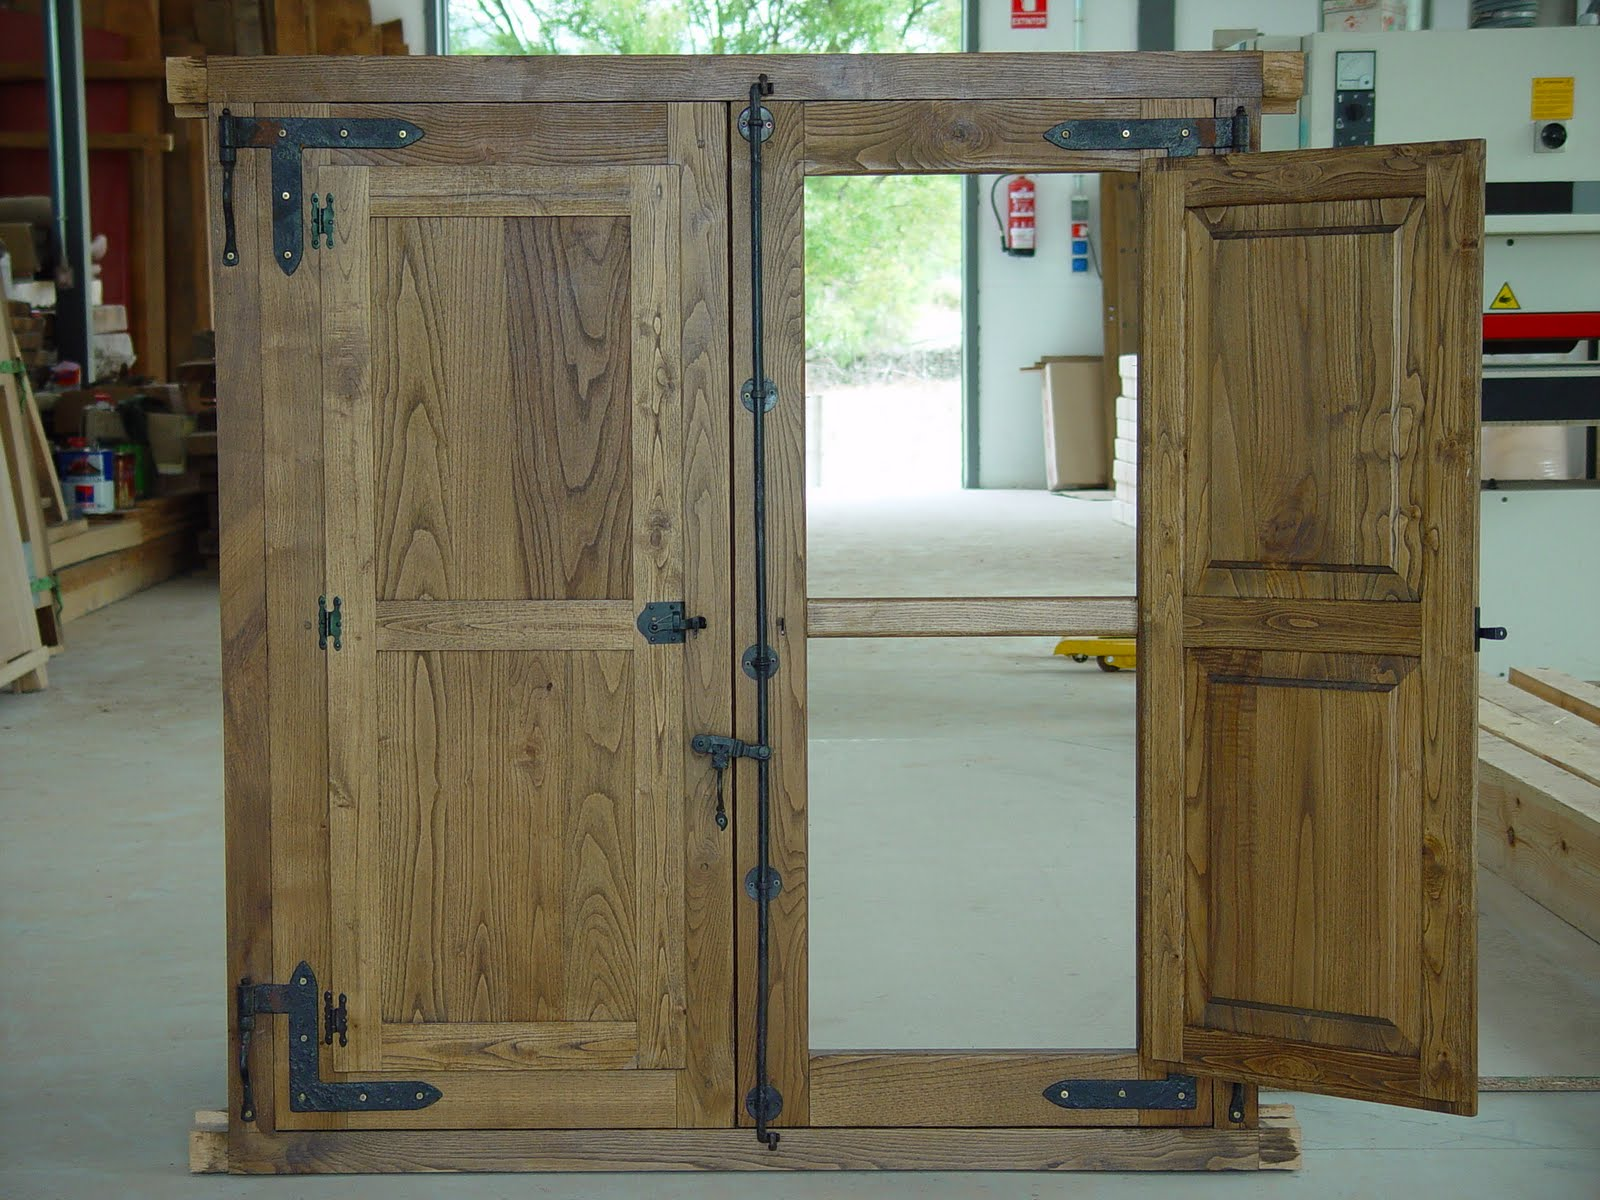 Carpinteria de madera corriols artesanos de hervas ventanas for Herrajes para muebles rusticos